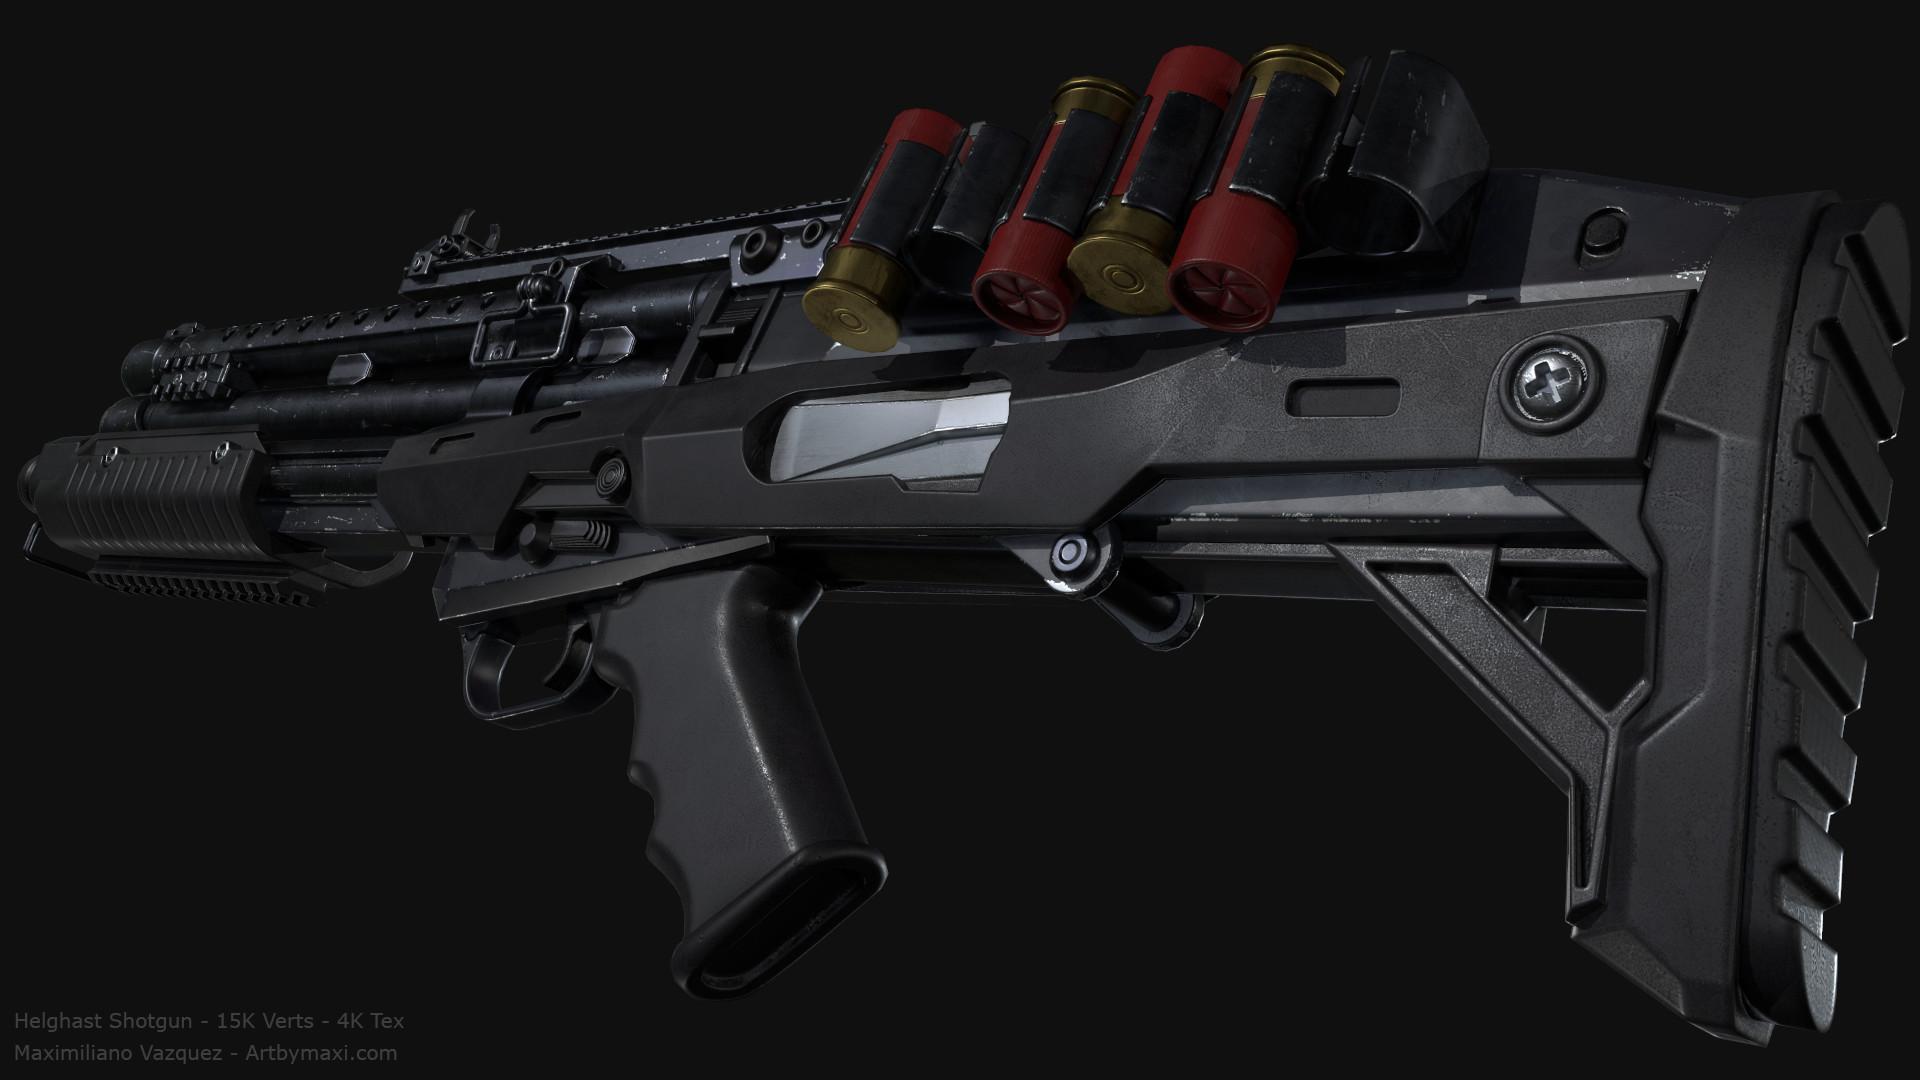 Maximiliano vazquez hellghast shotgun lp9